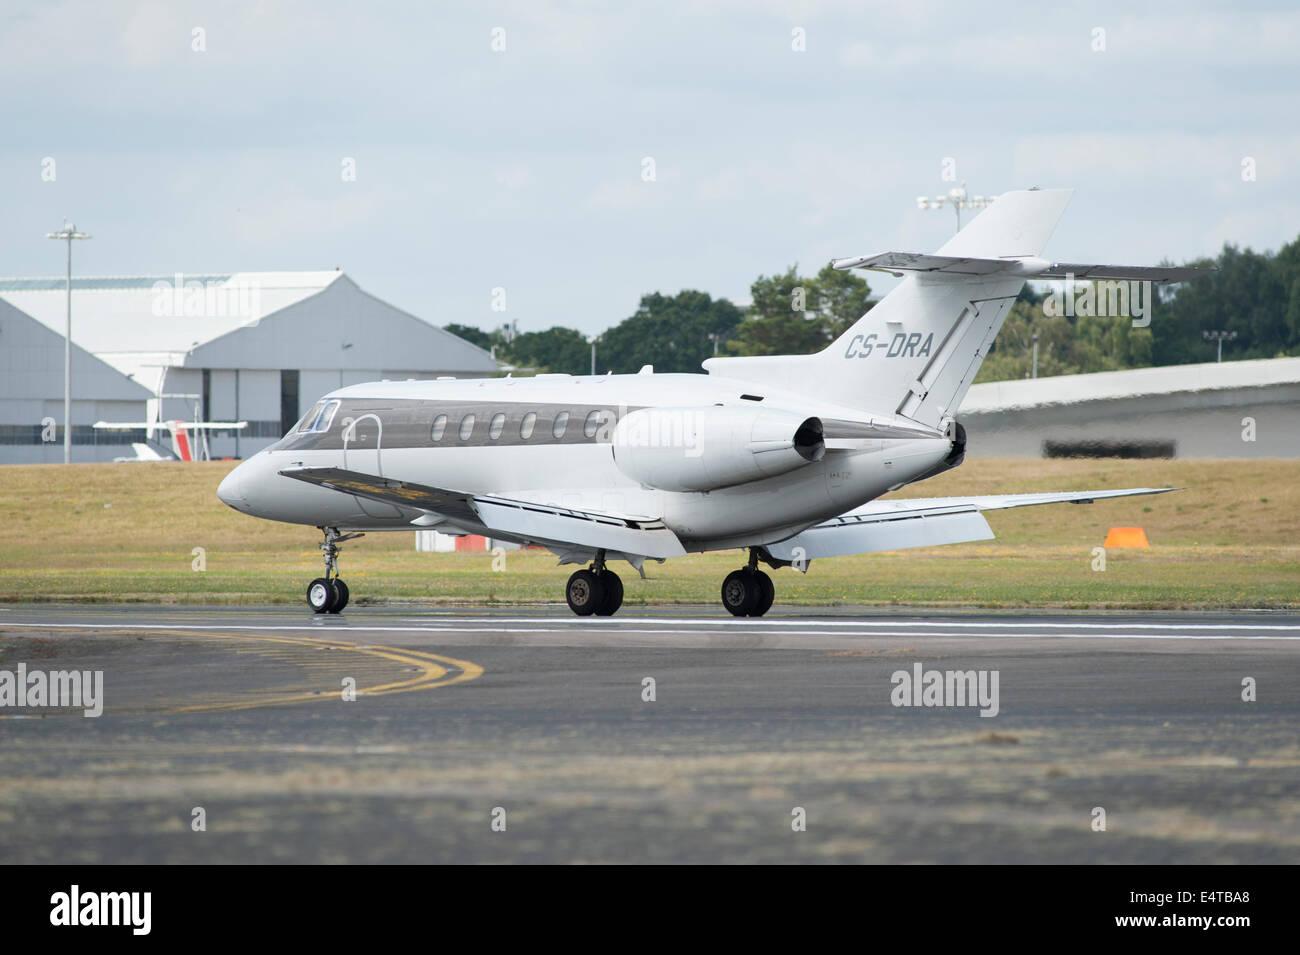 Raytheon Hawker 800XP jet landing at Farnborough Airport - Stock Image